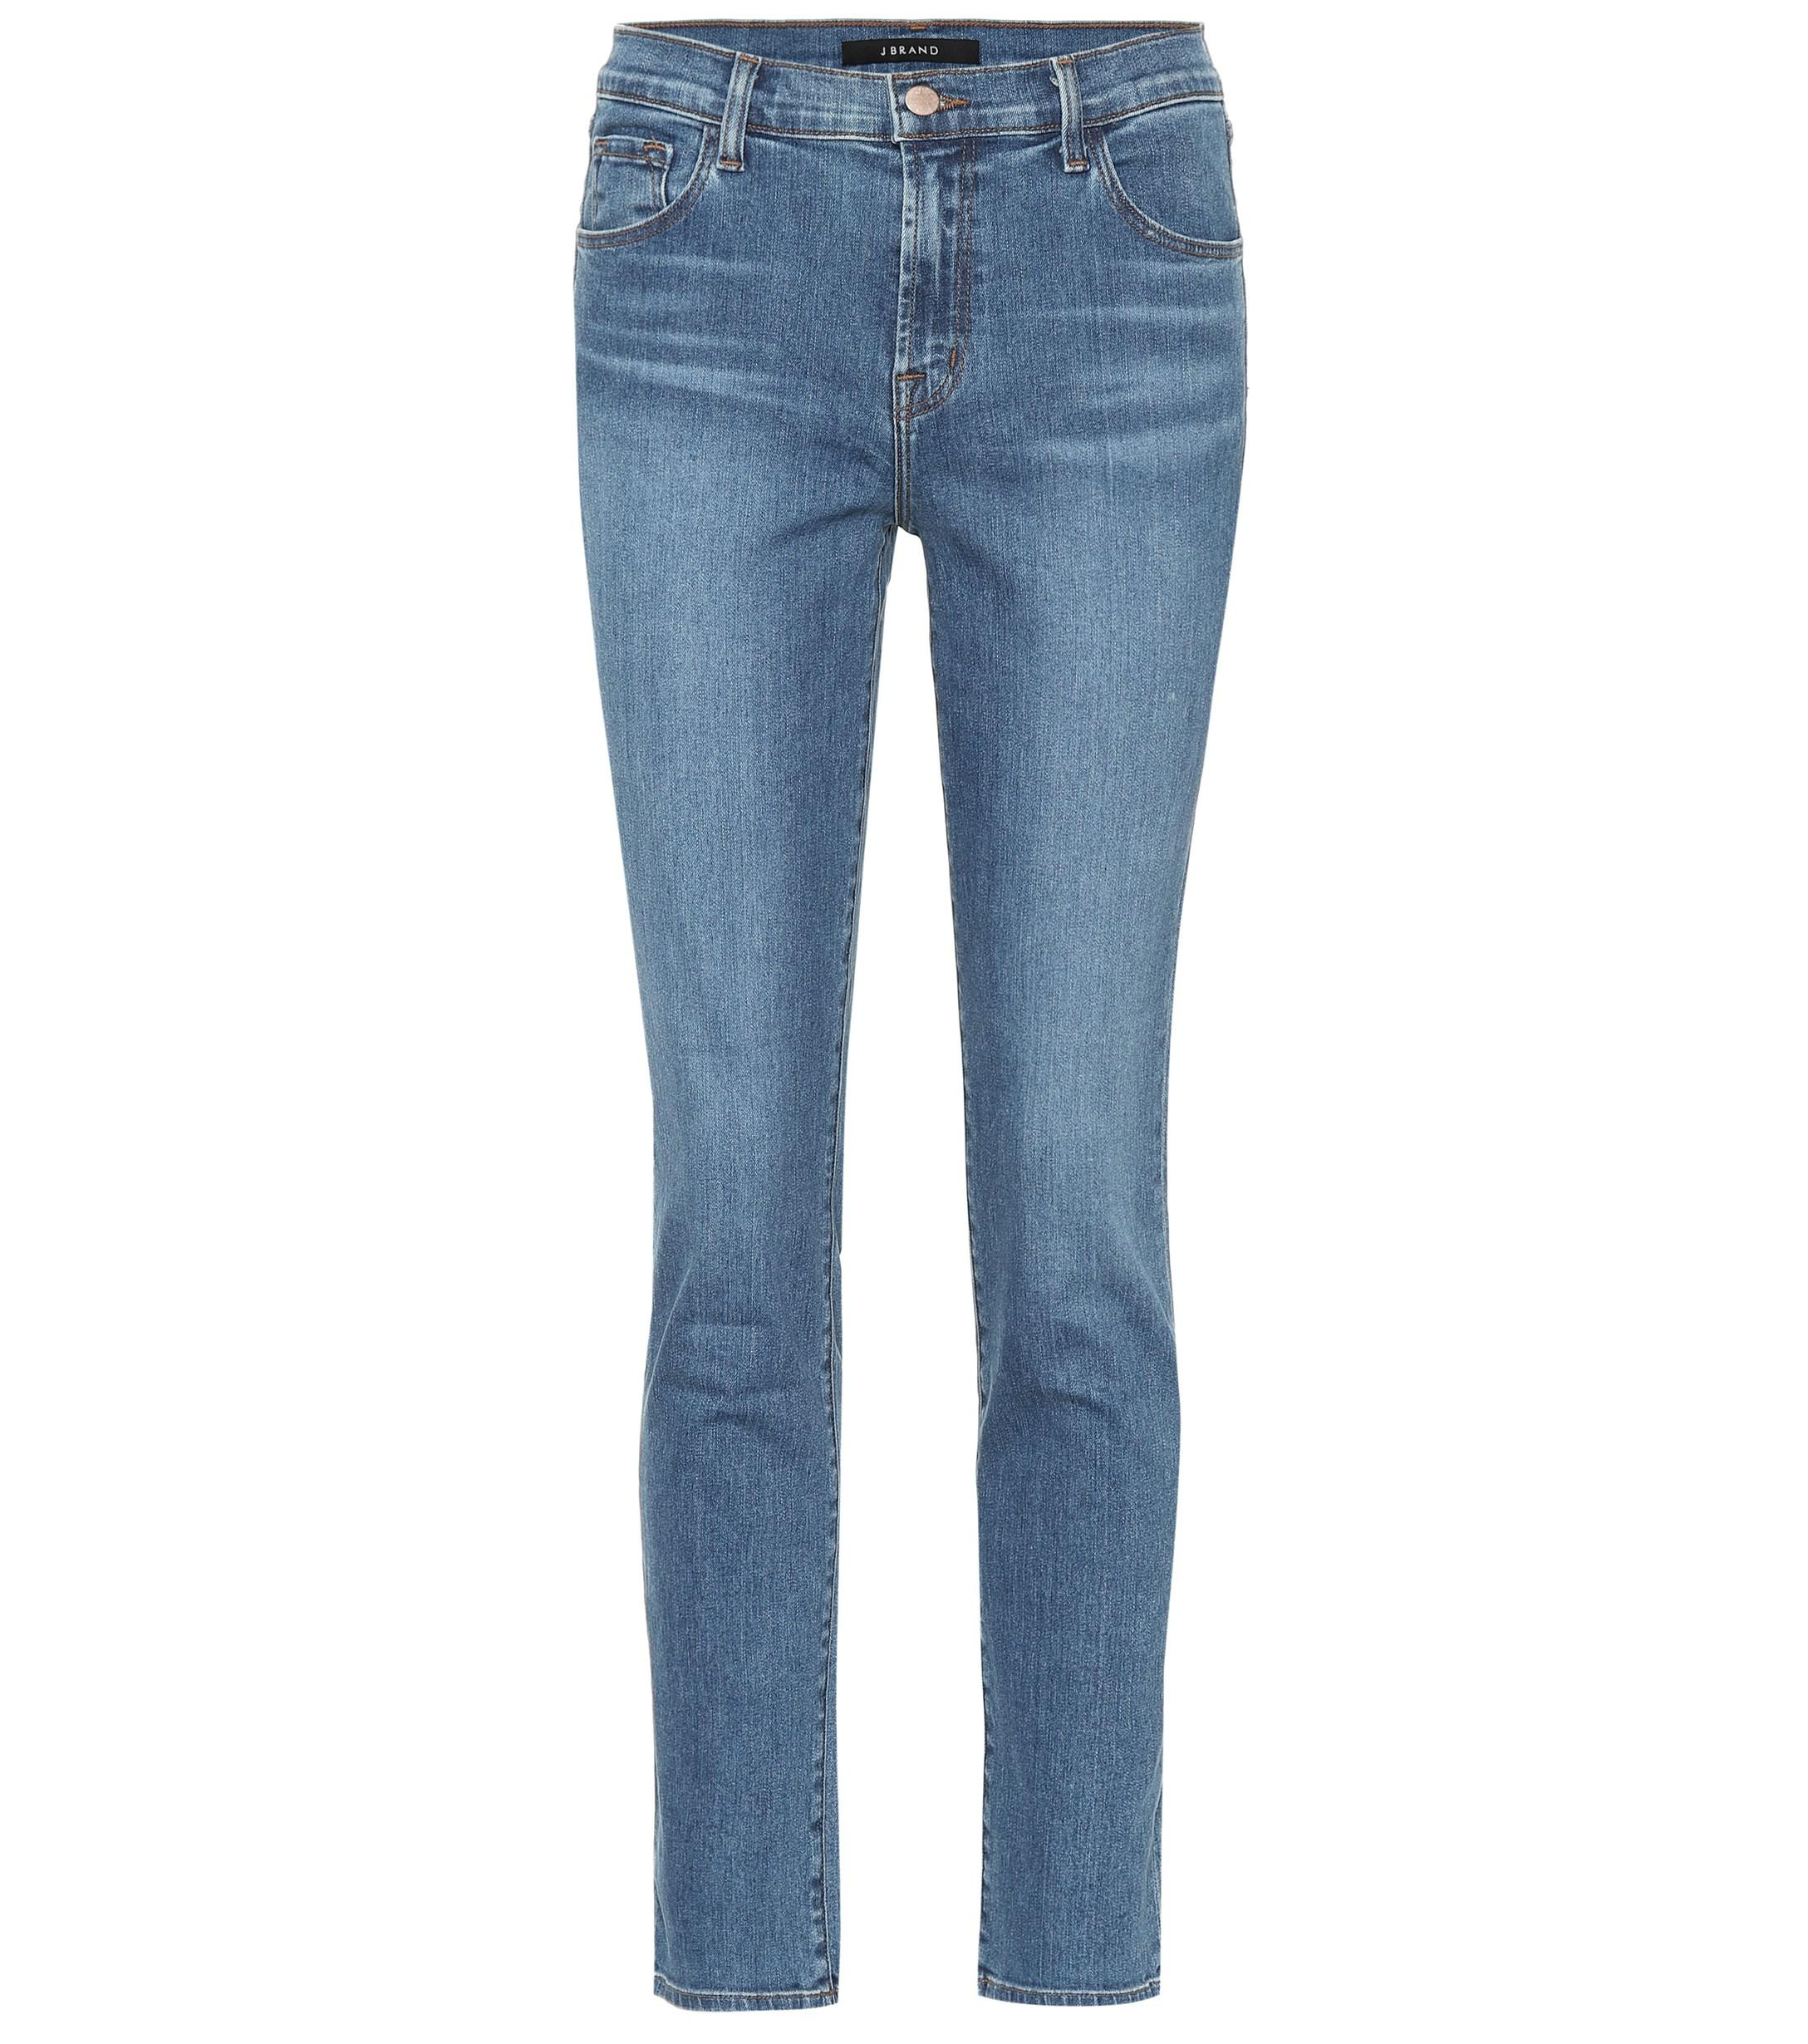 52aeb0f0d33c J Brand - Blue Ruby Cropped High-rise Jeans - Lyst. View fullscreen